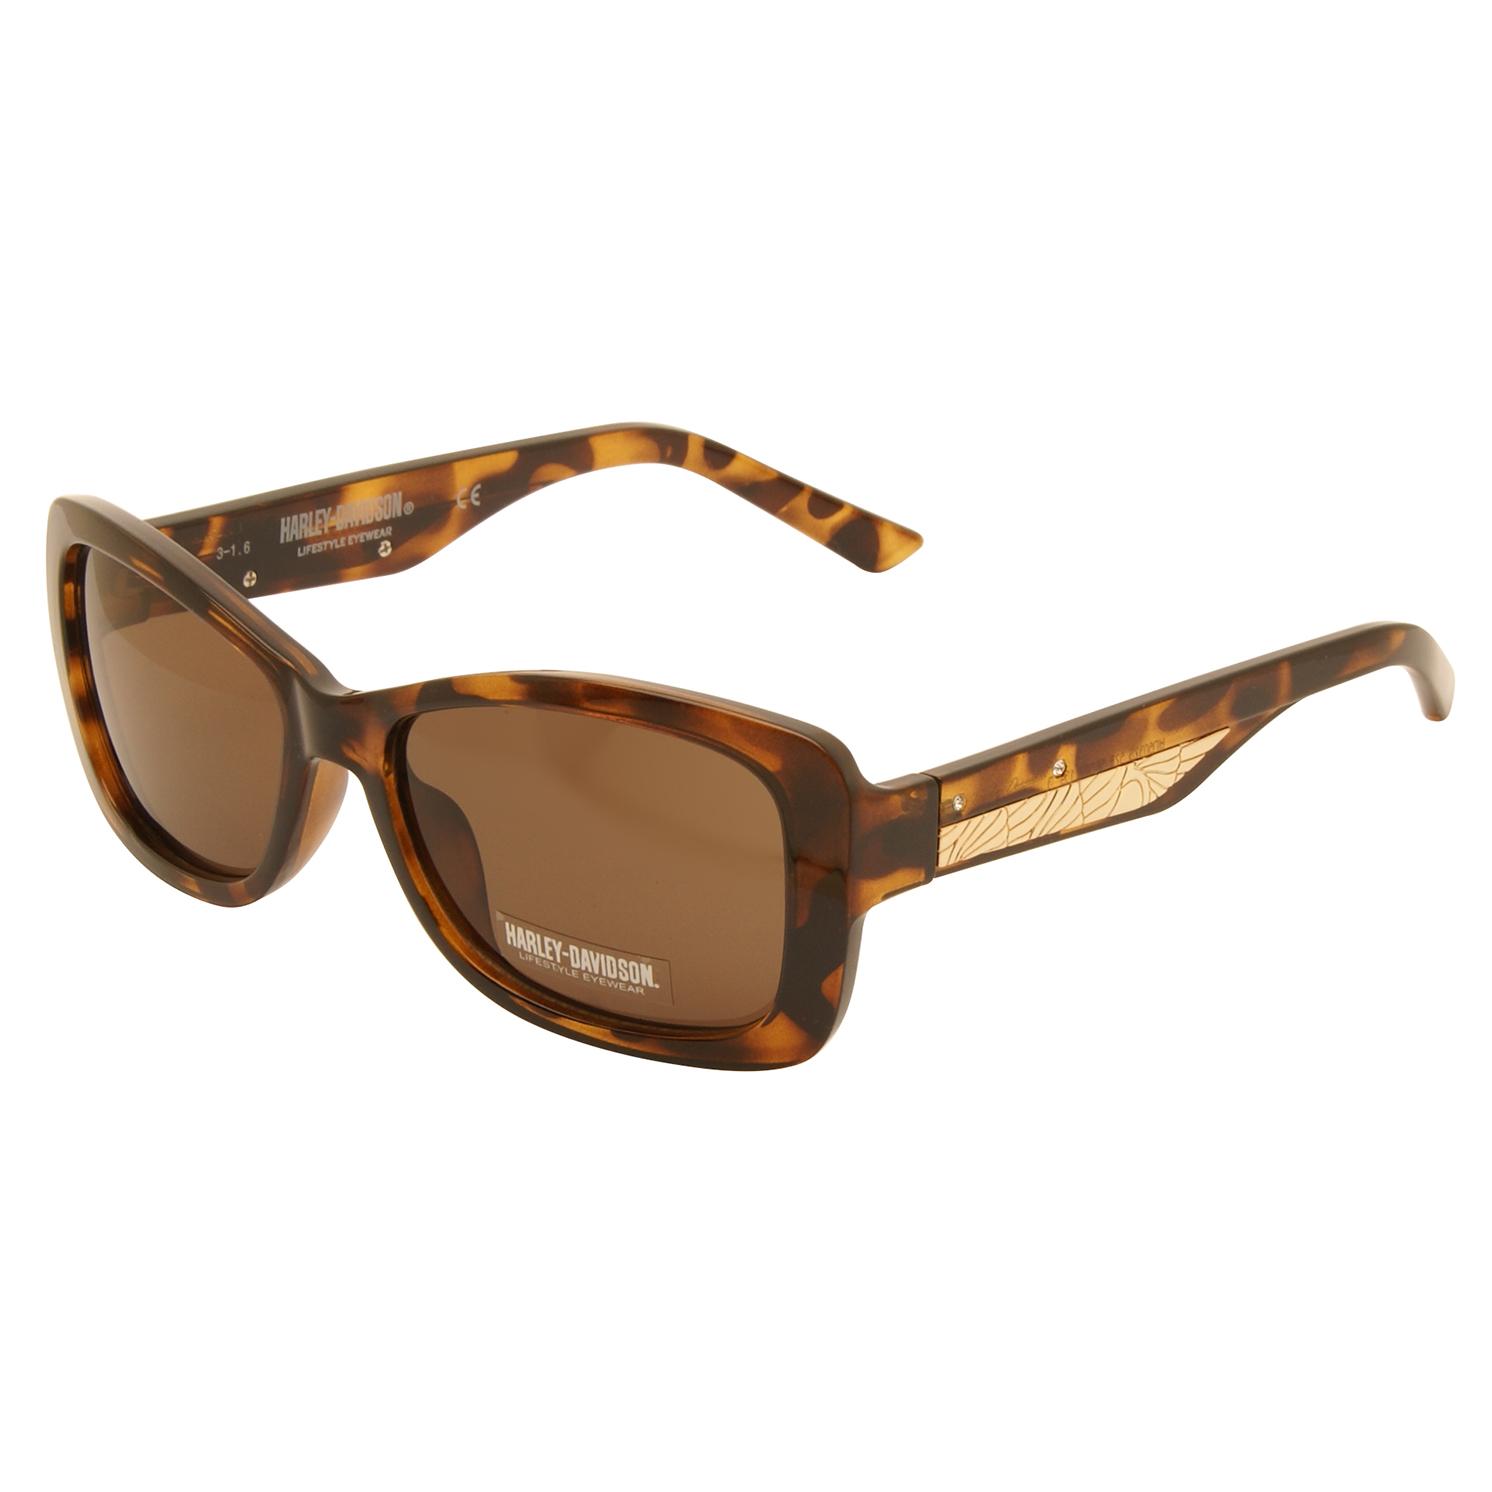 Harley Davidson – Brown Tortoiseshell/Diamante Classic Sunglasses with Case